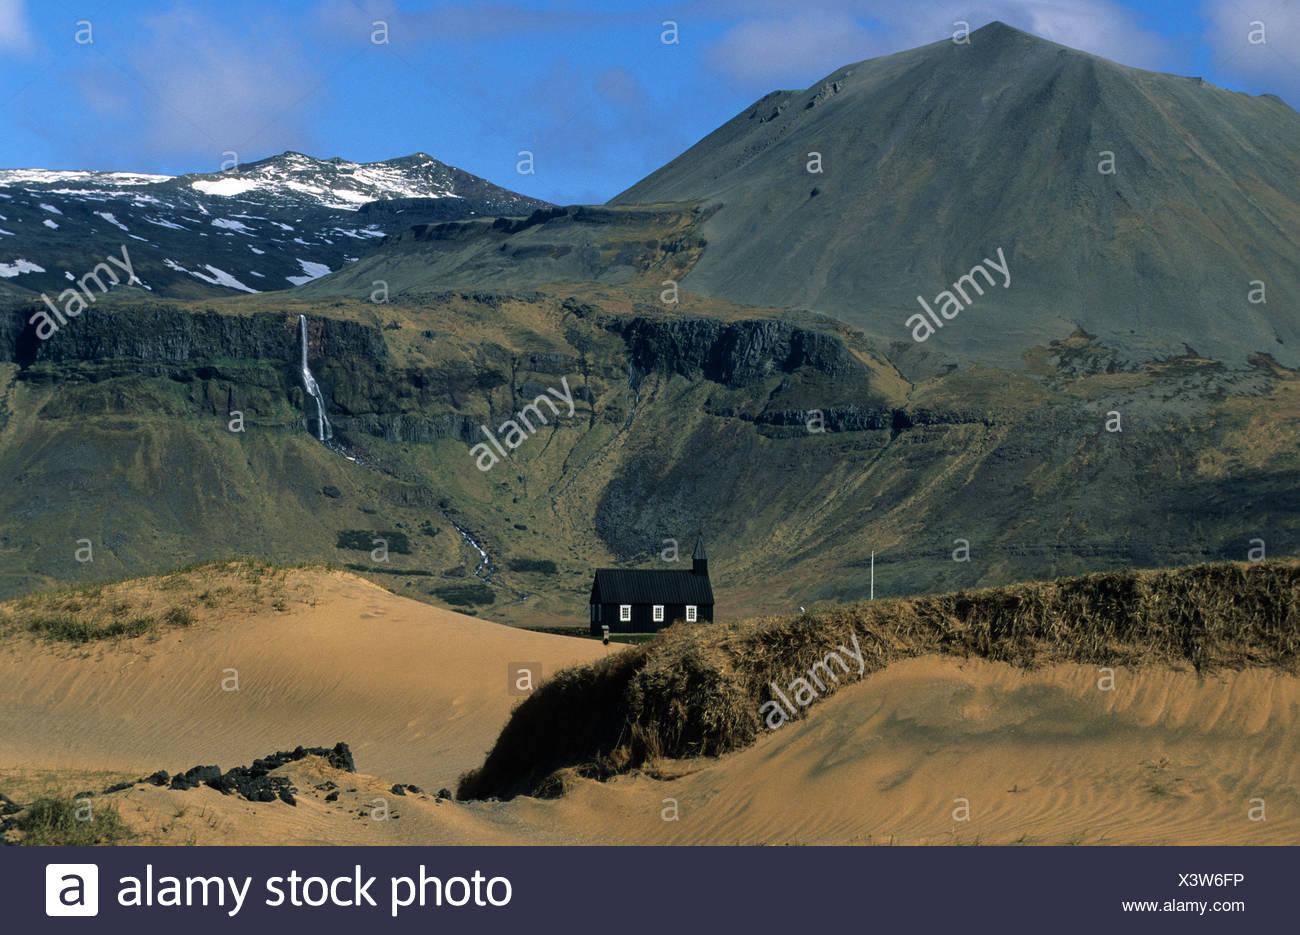 Budir Iceland church mountains sand dunes waterfall landscape - Stock Image